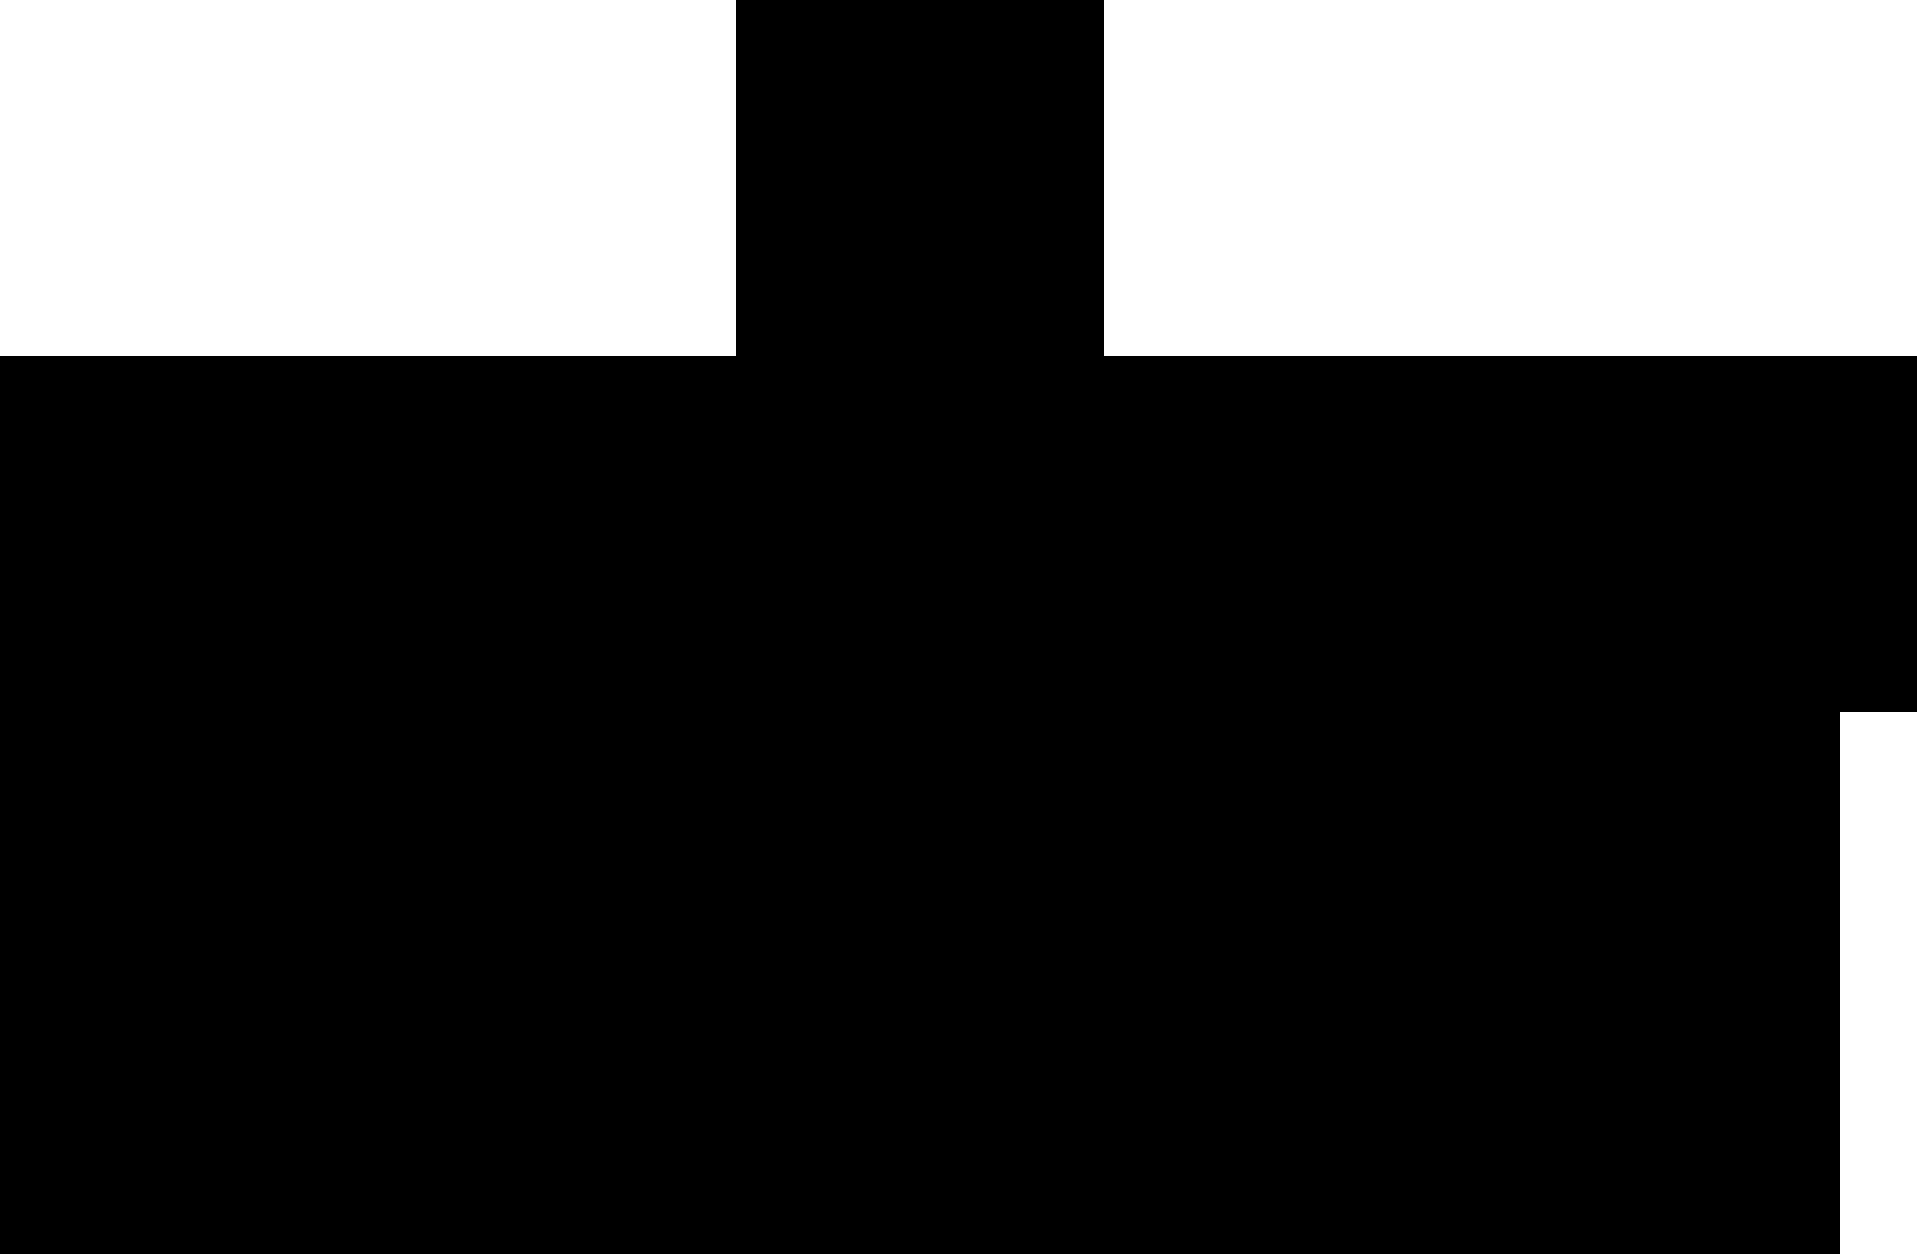 Galaxy clipart monochrome. Samsung s interest iphone